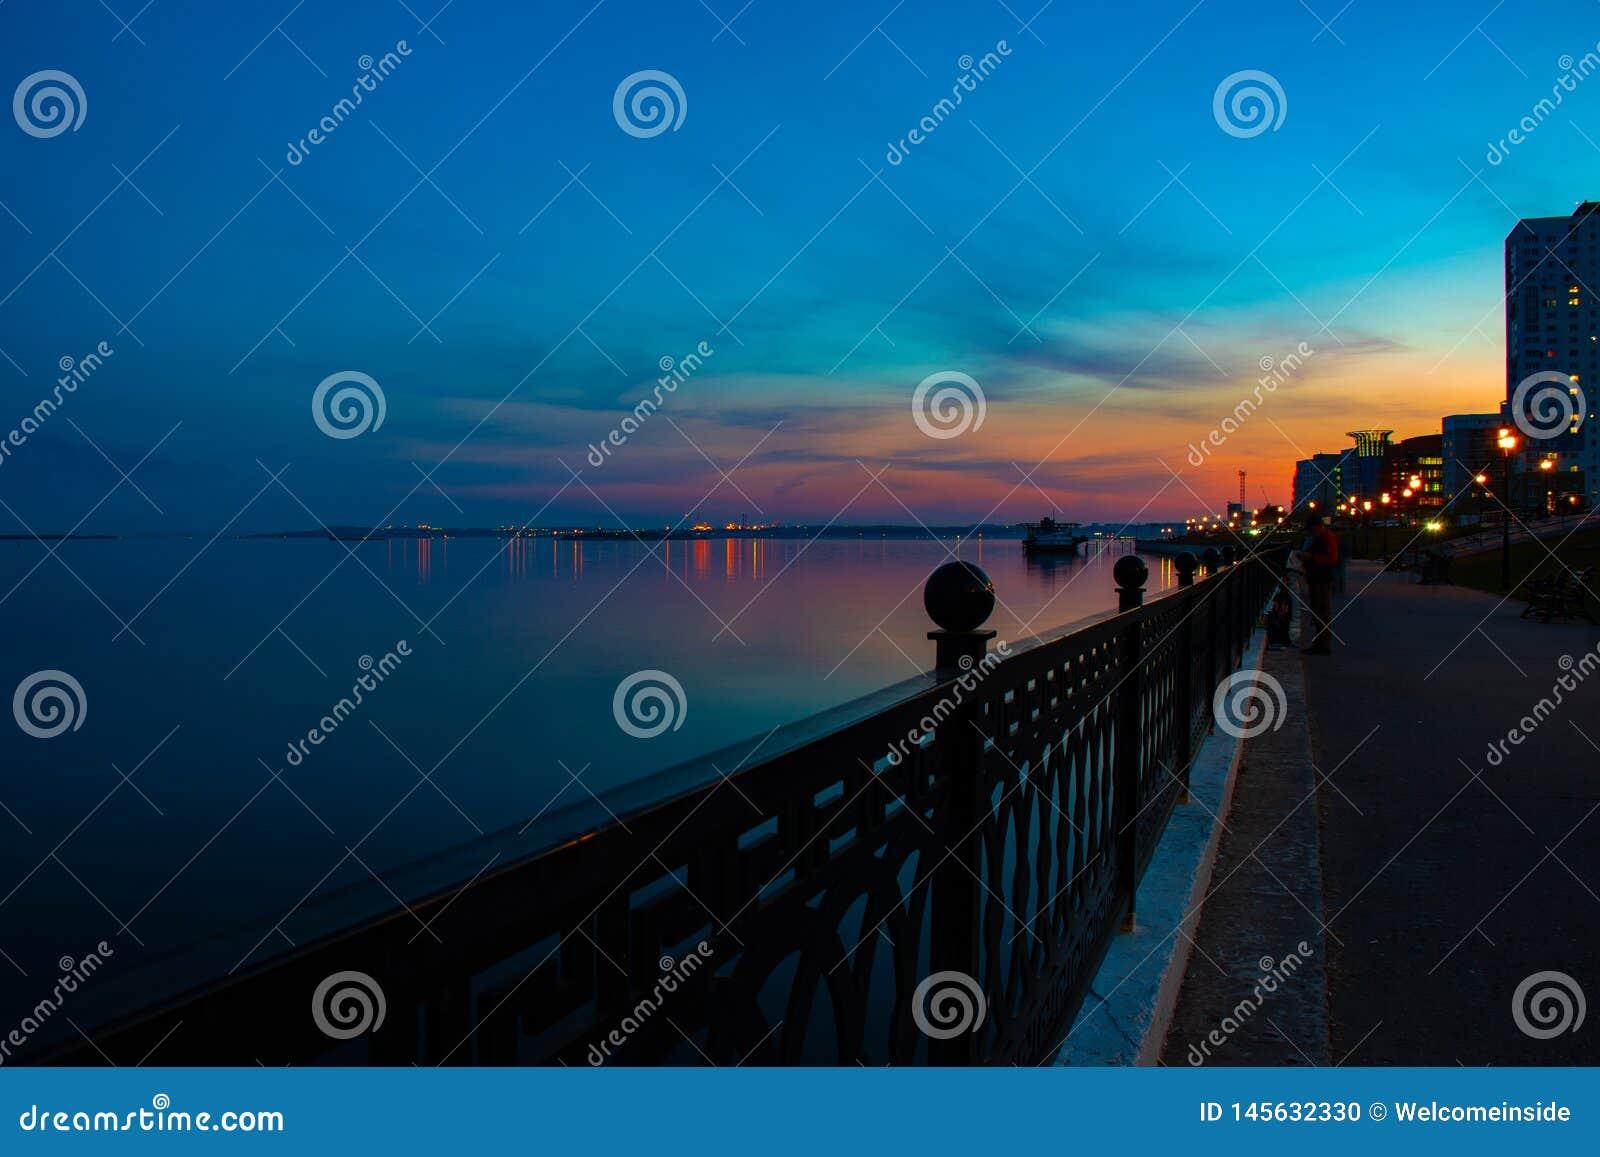 Spring night city Saratov quay under sunset. Street decorative lights and beautiful sky